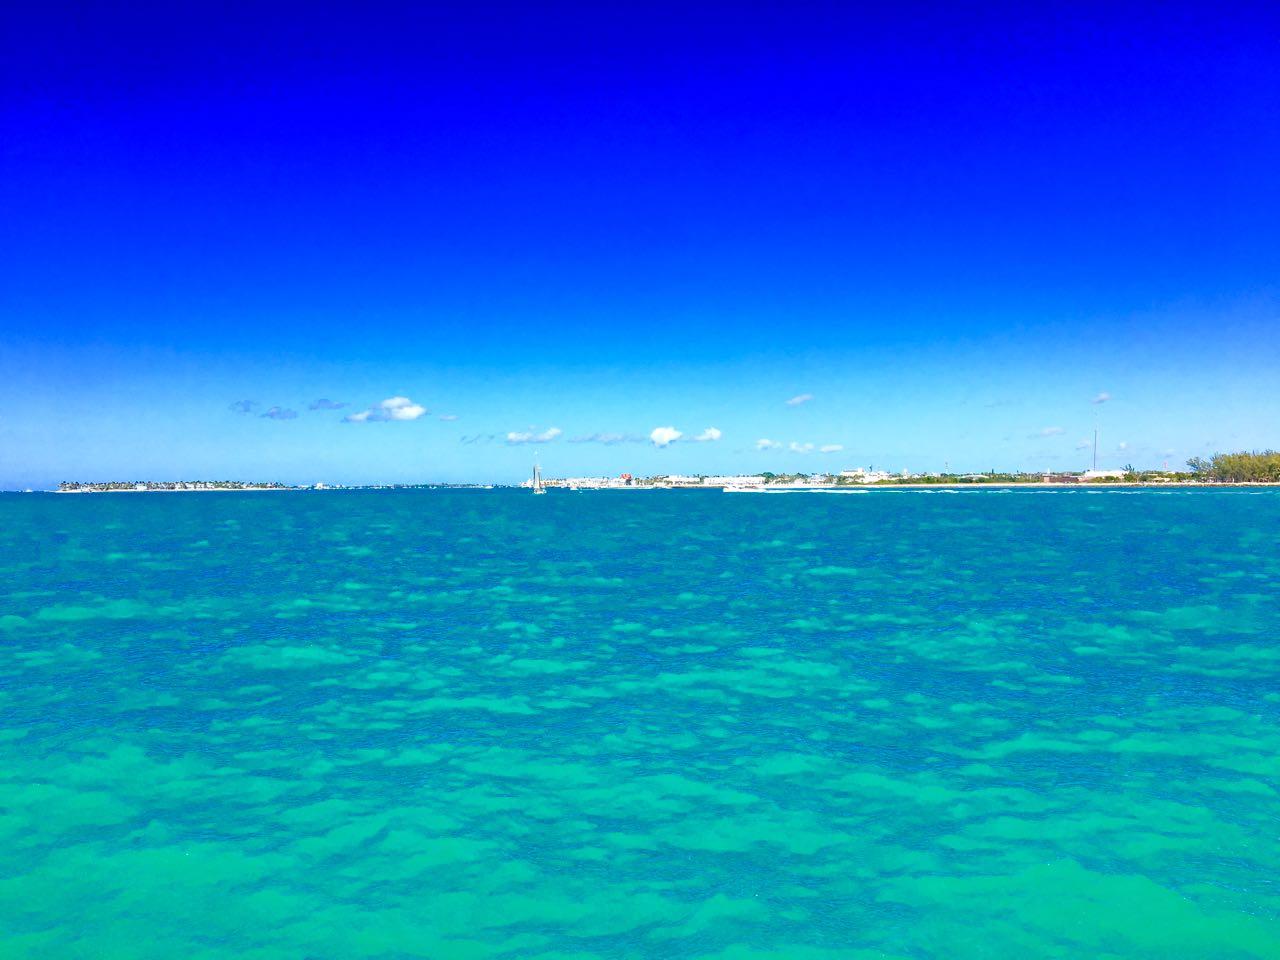 Marco Island To Key West, Florida